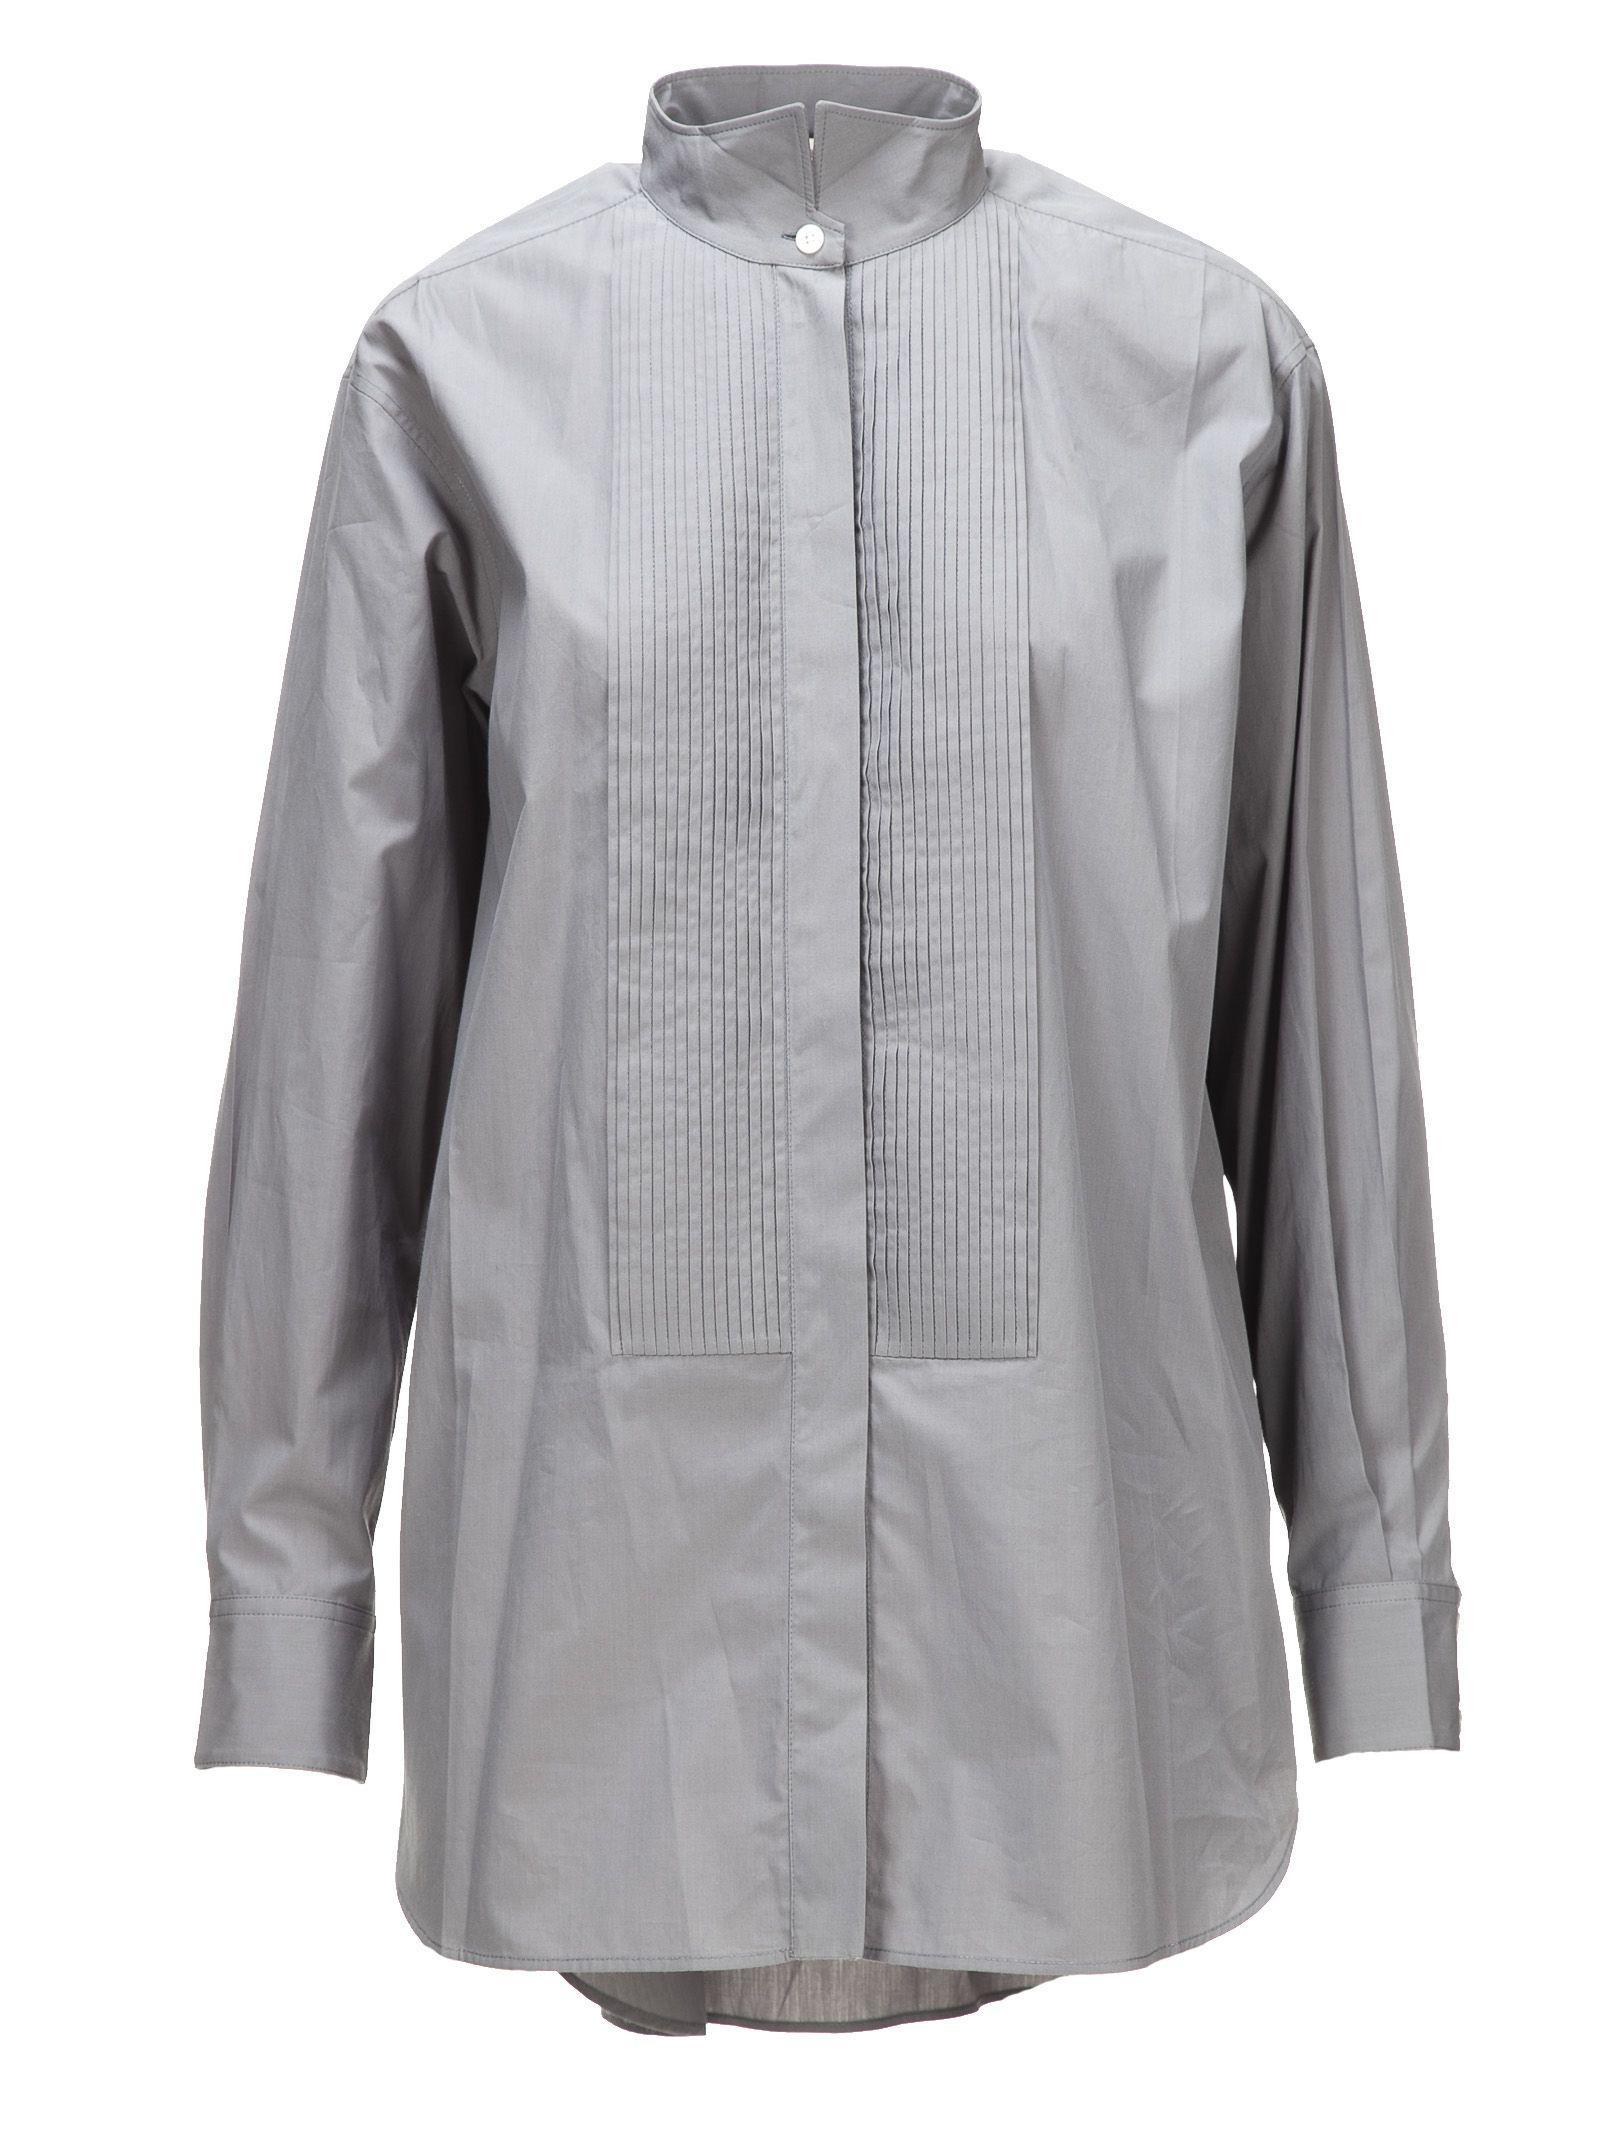 Celine CÉline Pleated Shirt In 09hk